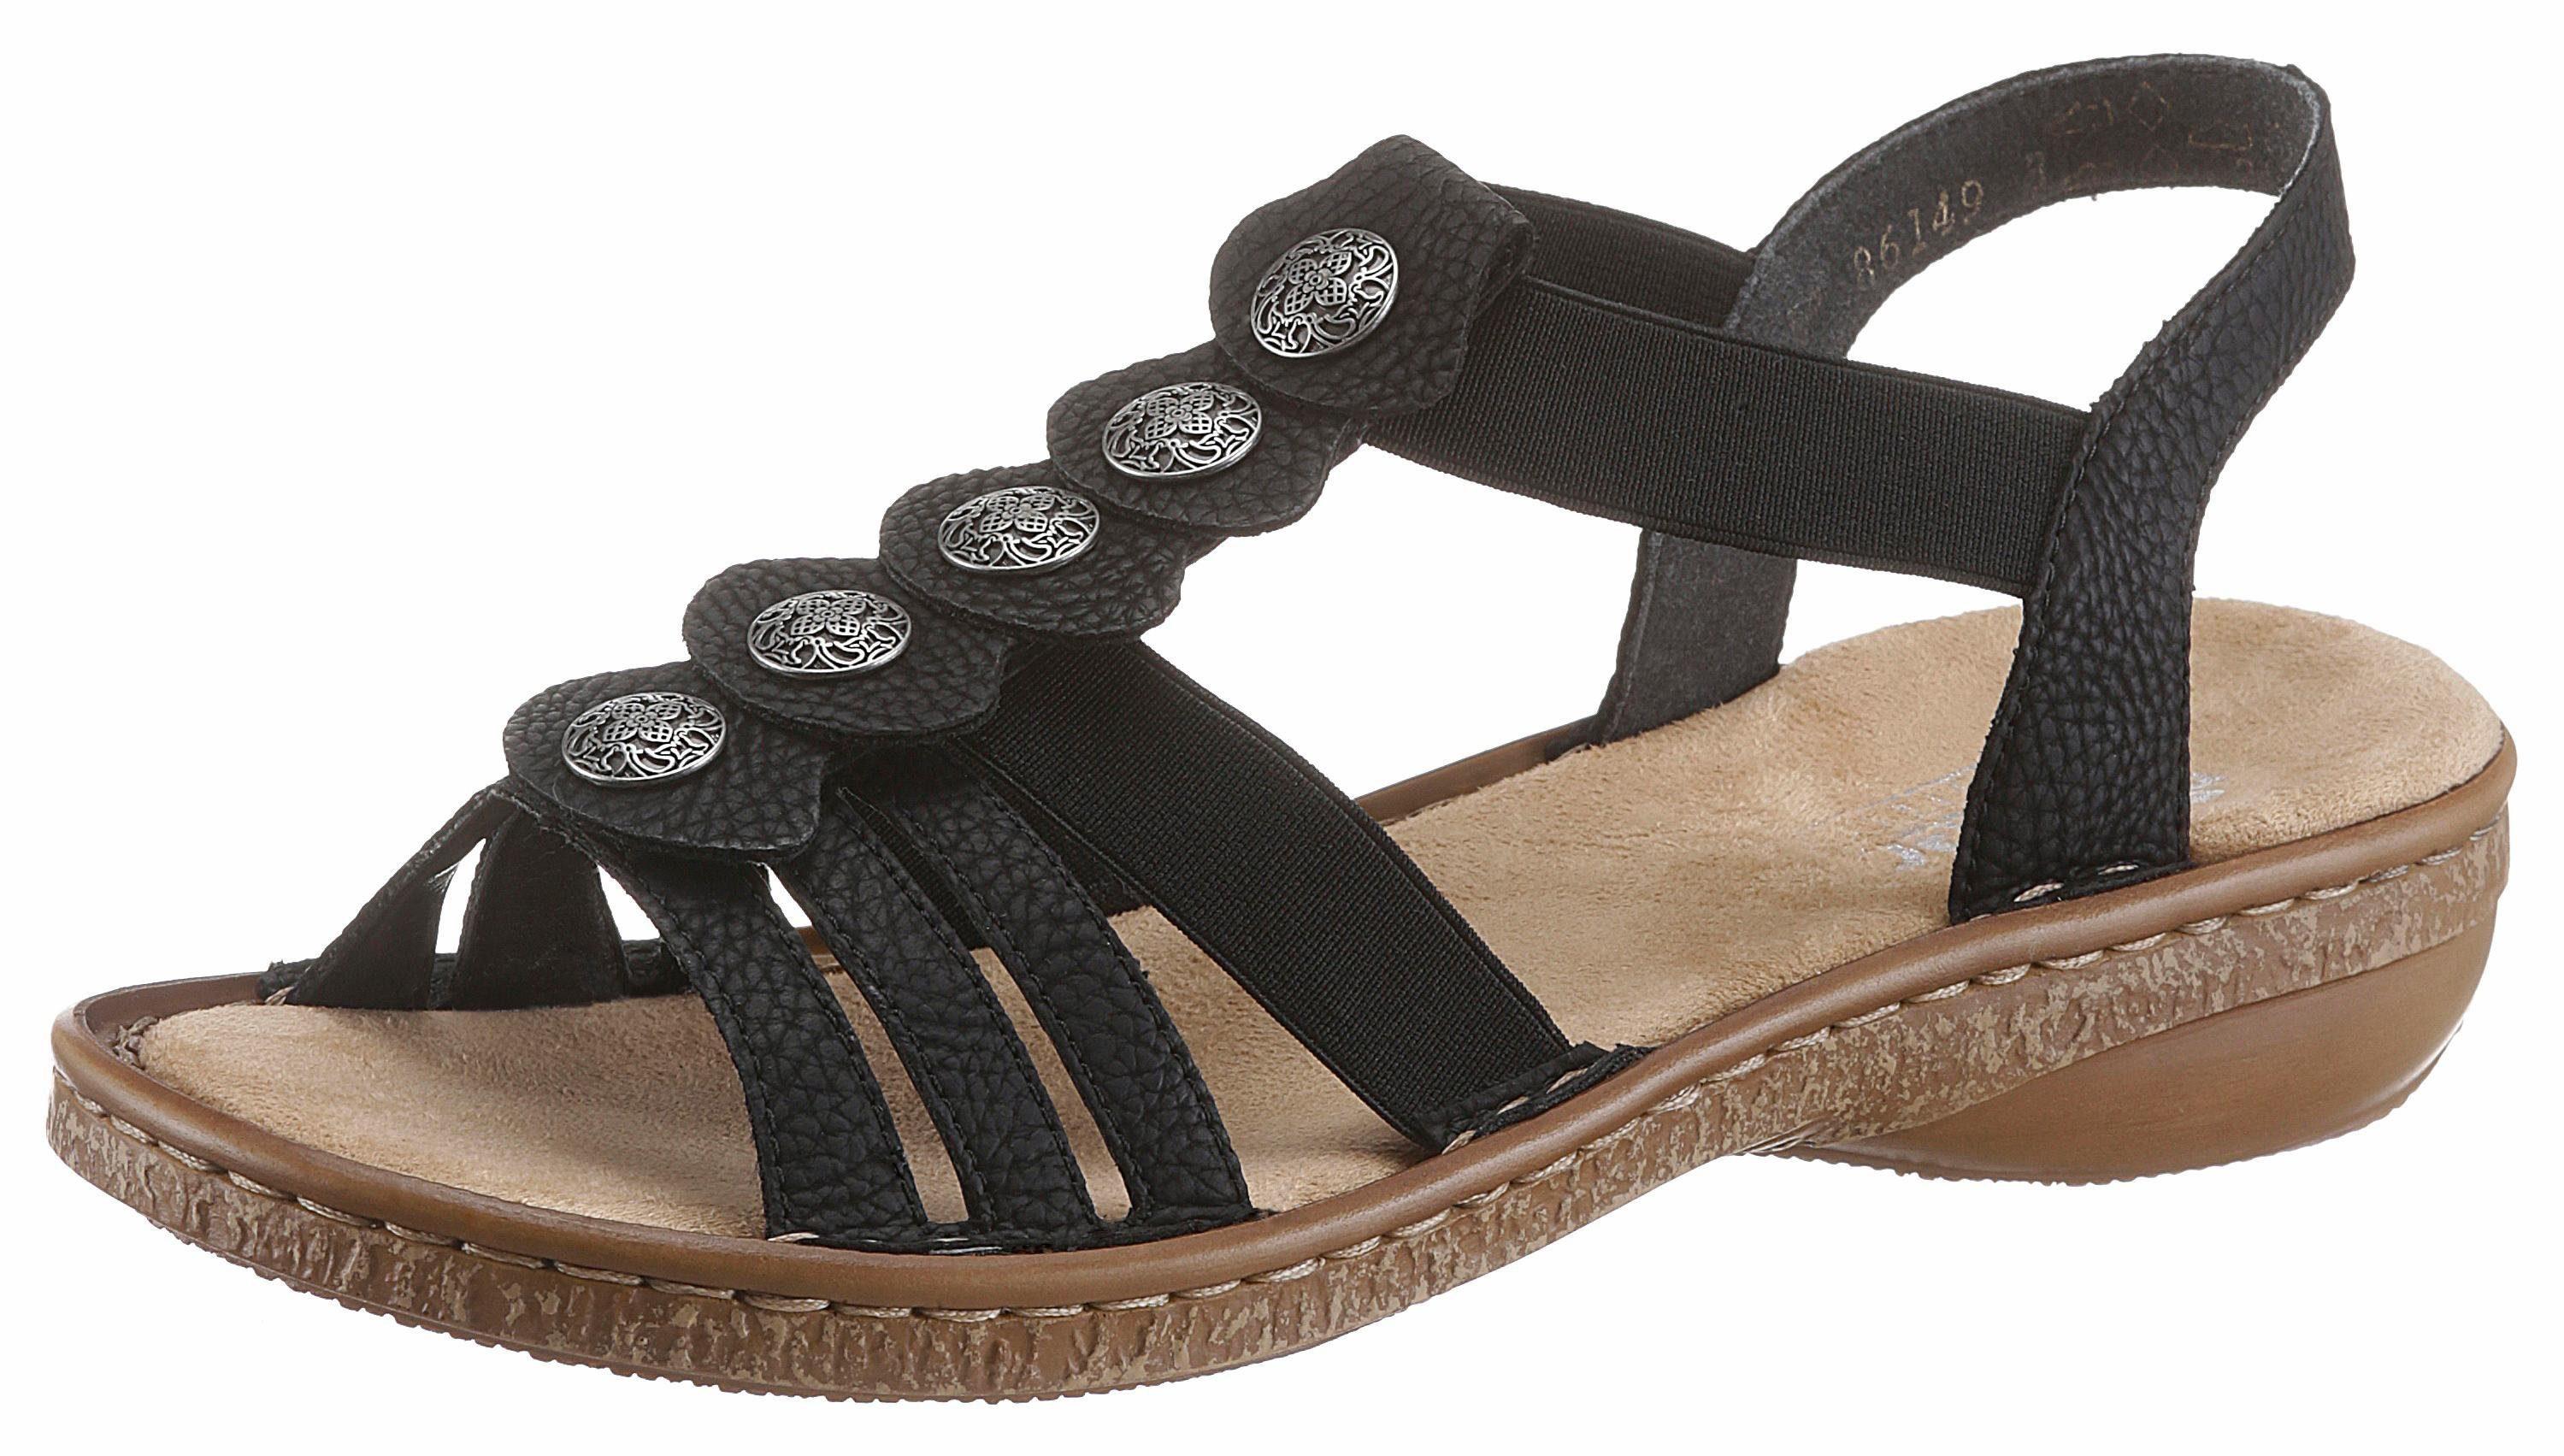 Sandales Rieker Noir 0lNrpc1qr2